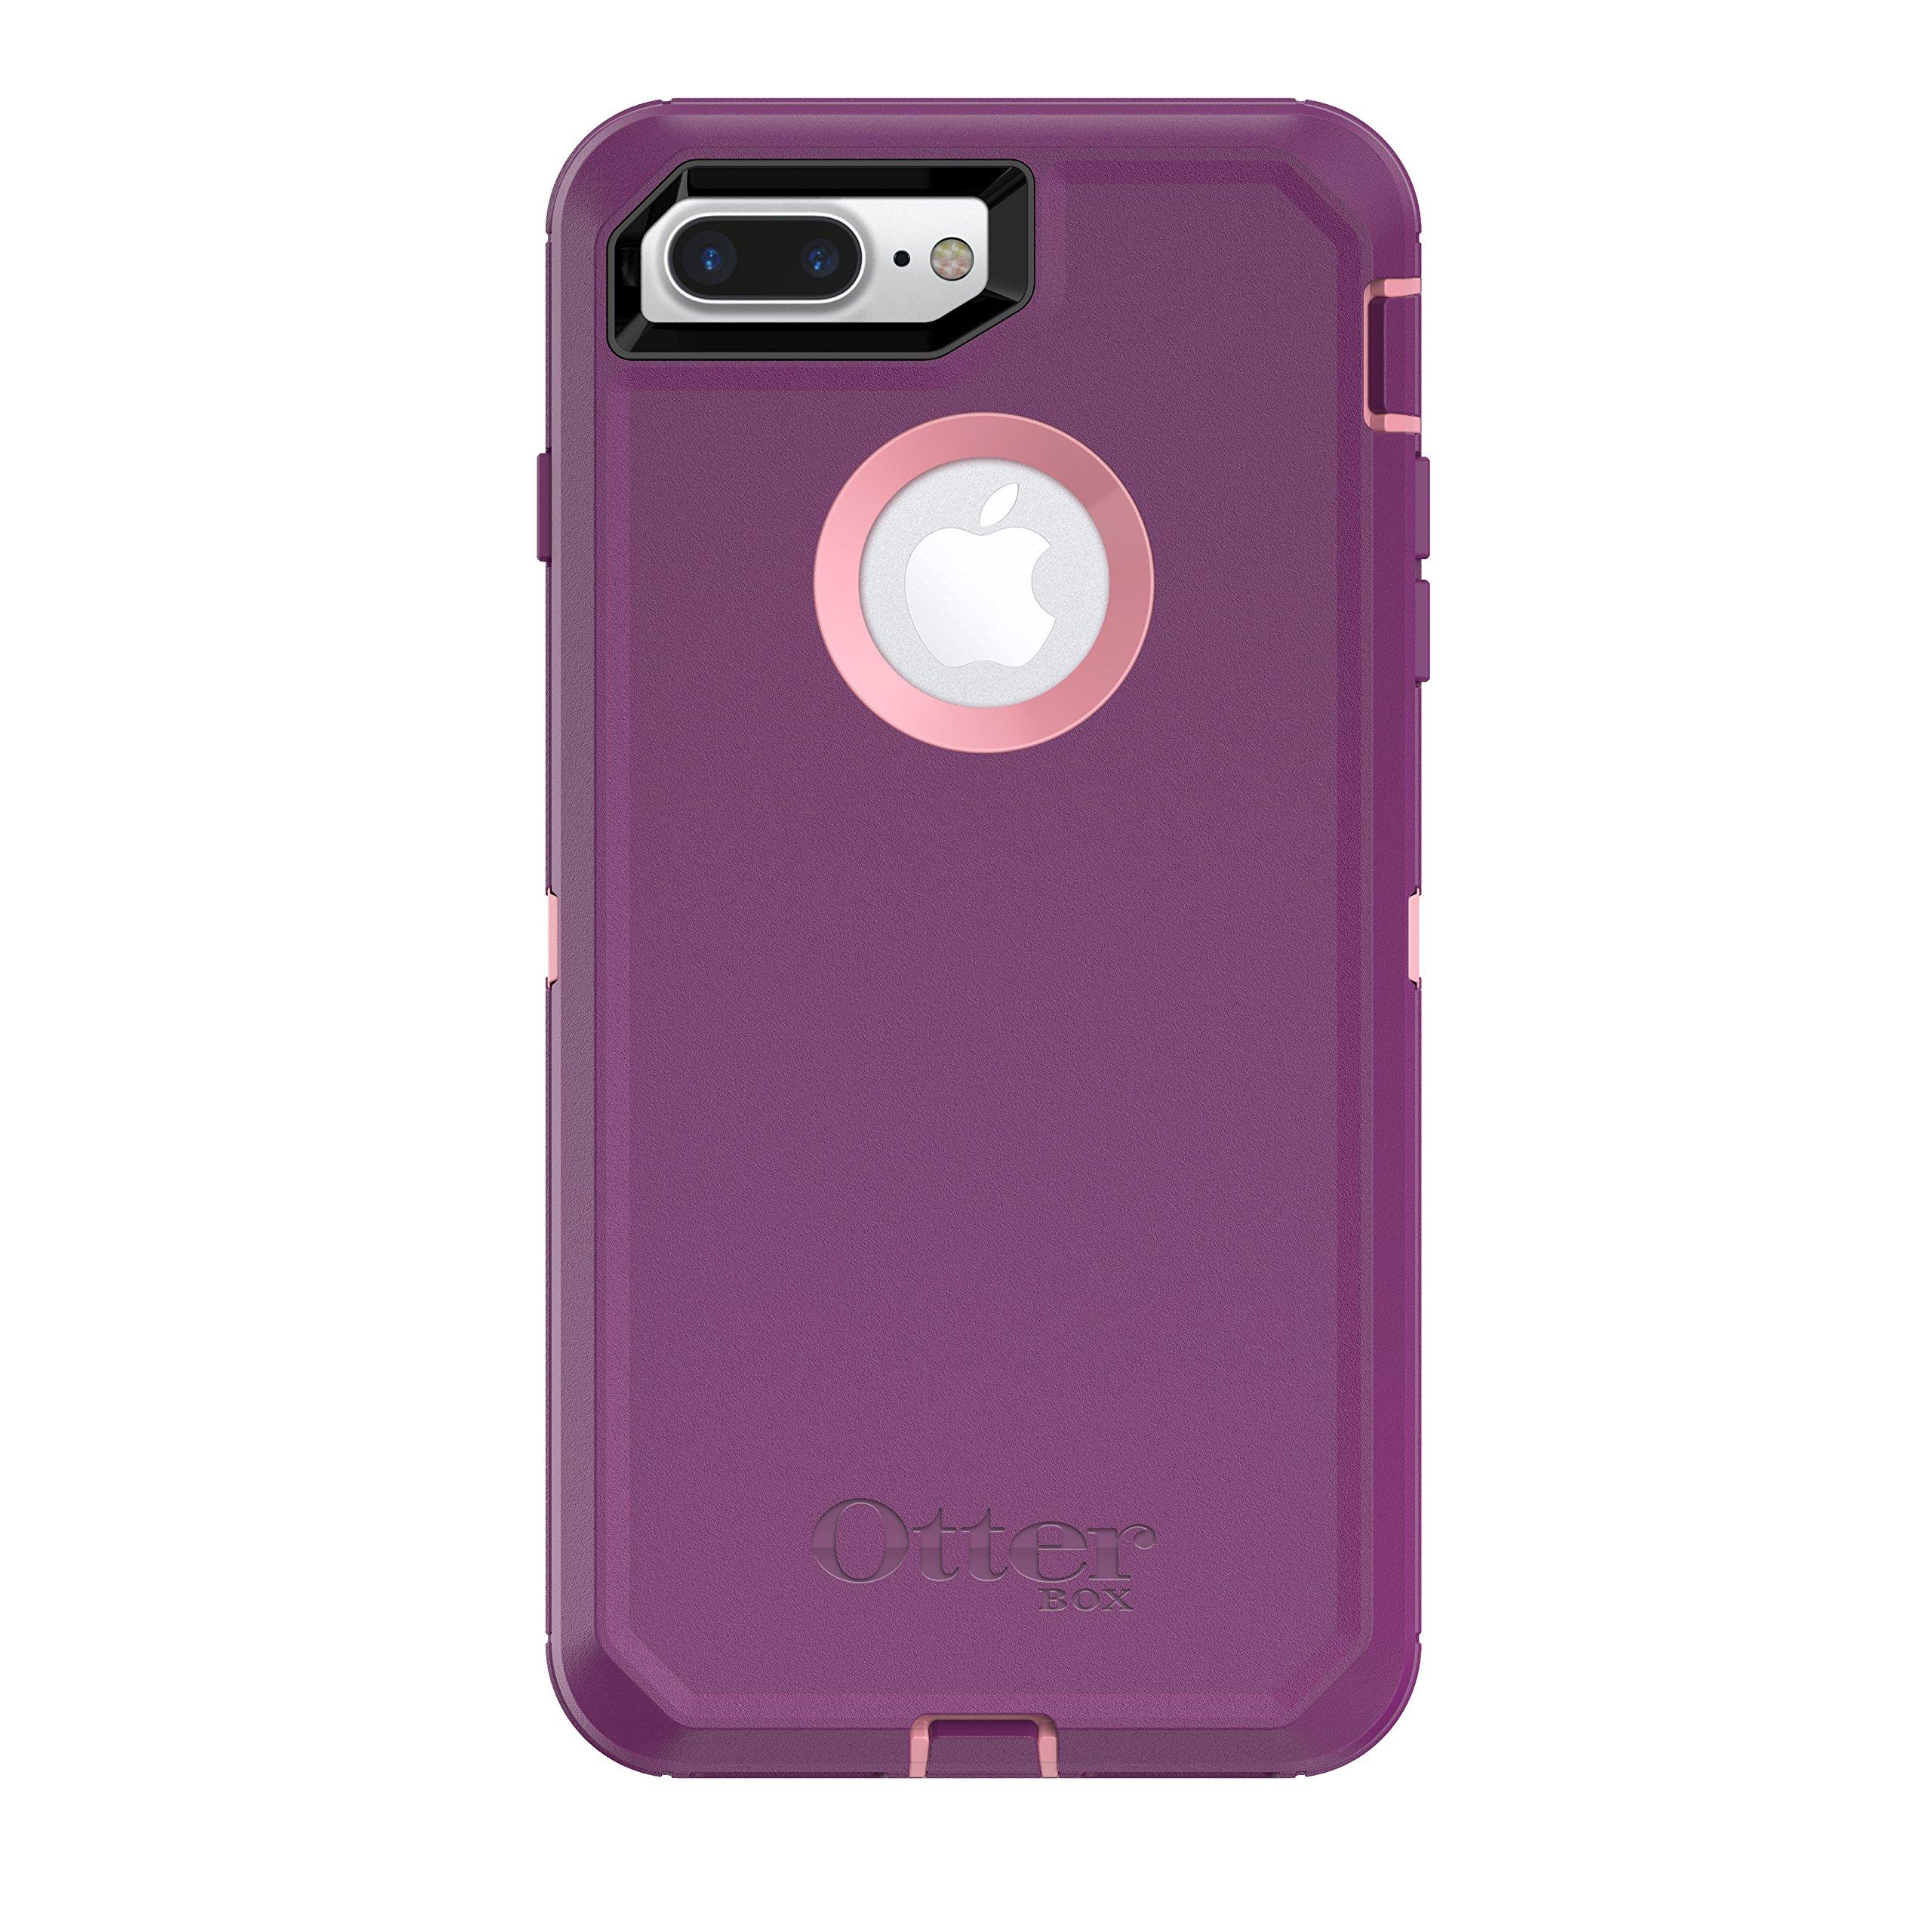 OtterBox Defender Series Case for iPhone 8 Plus & iPhone 7 Plus (ONLY) - Vinyasa (Rosmarine/Plum Haze)